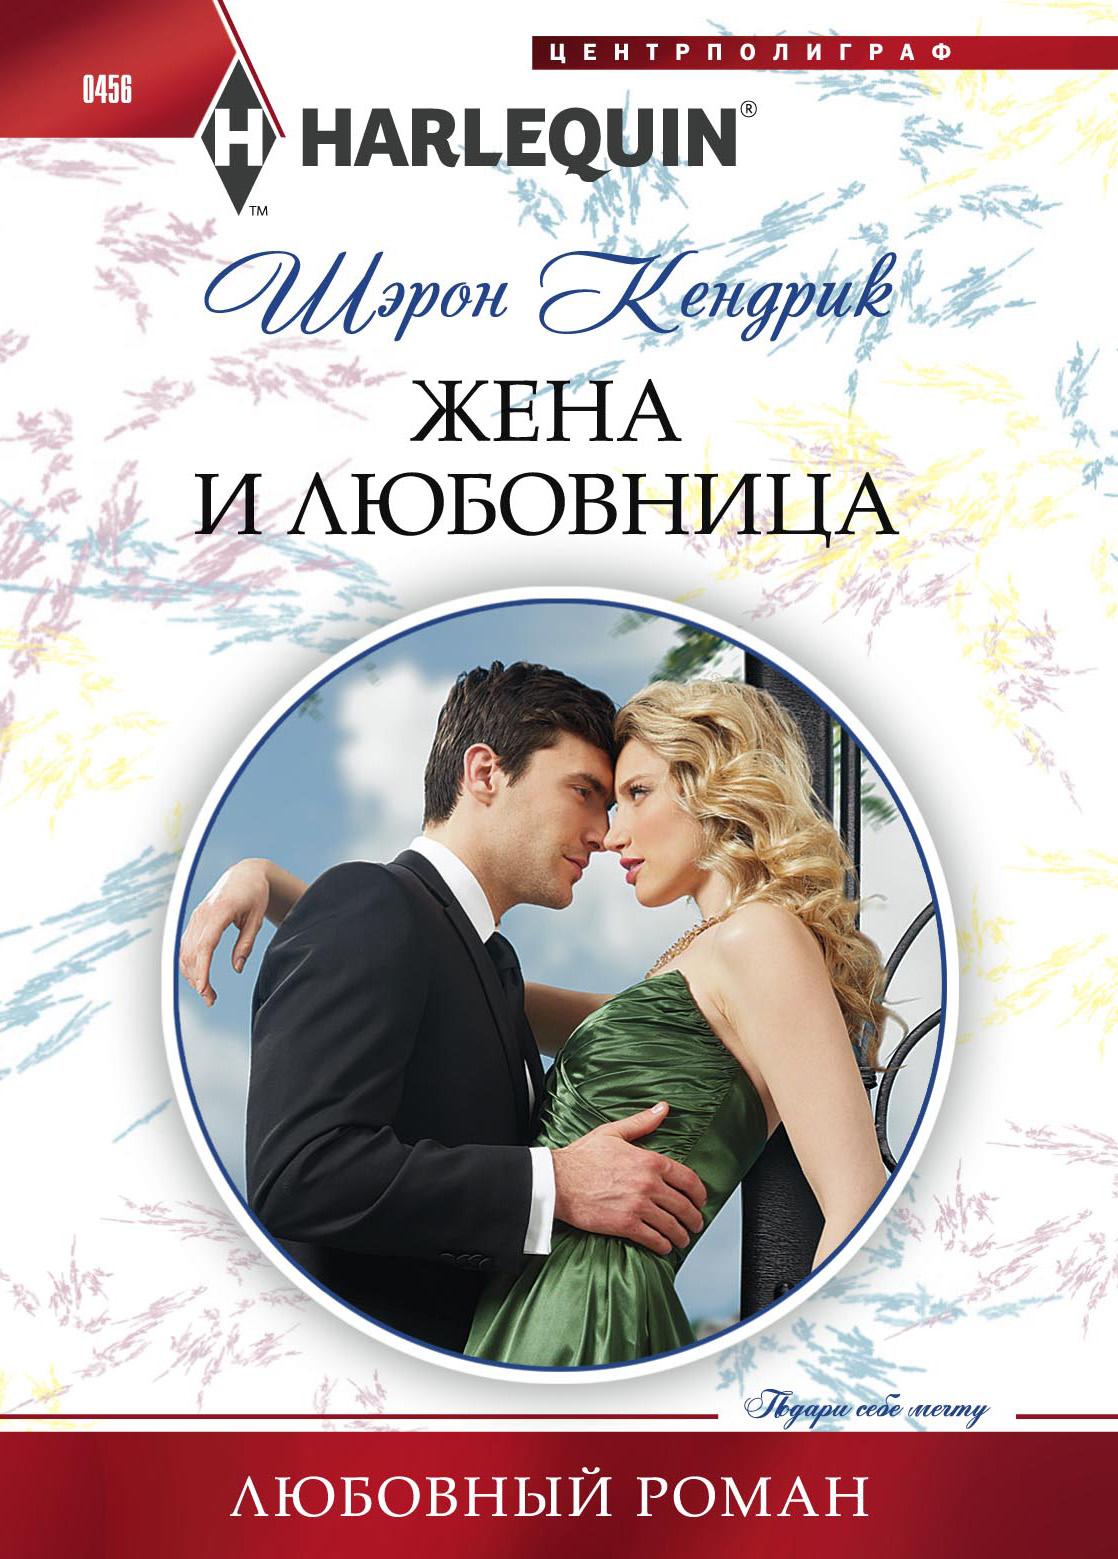 Шэрон Кендрик Жена и любовница